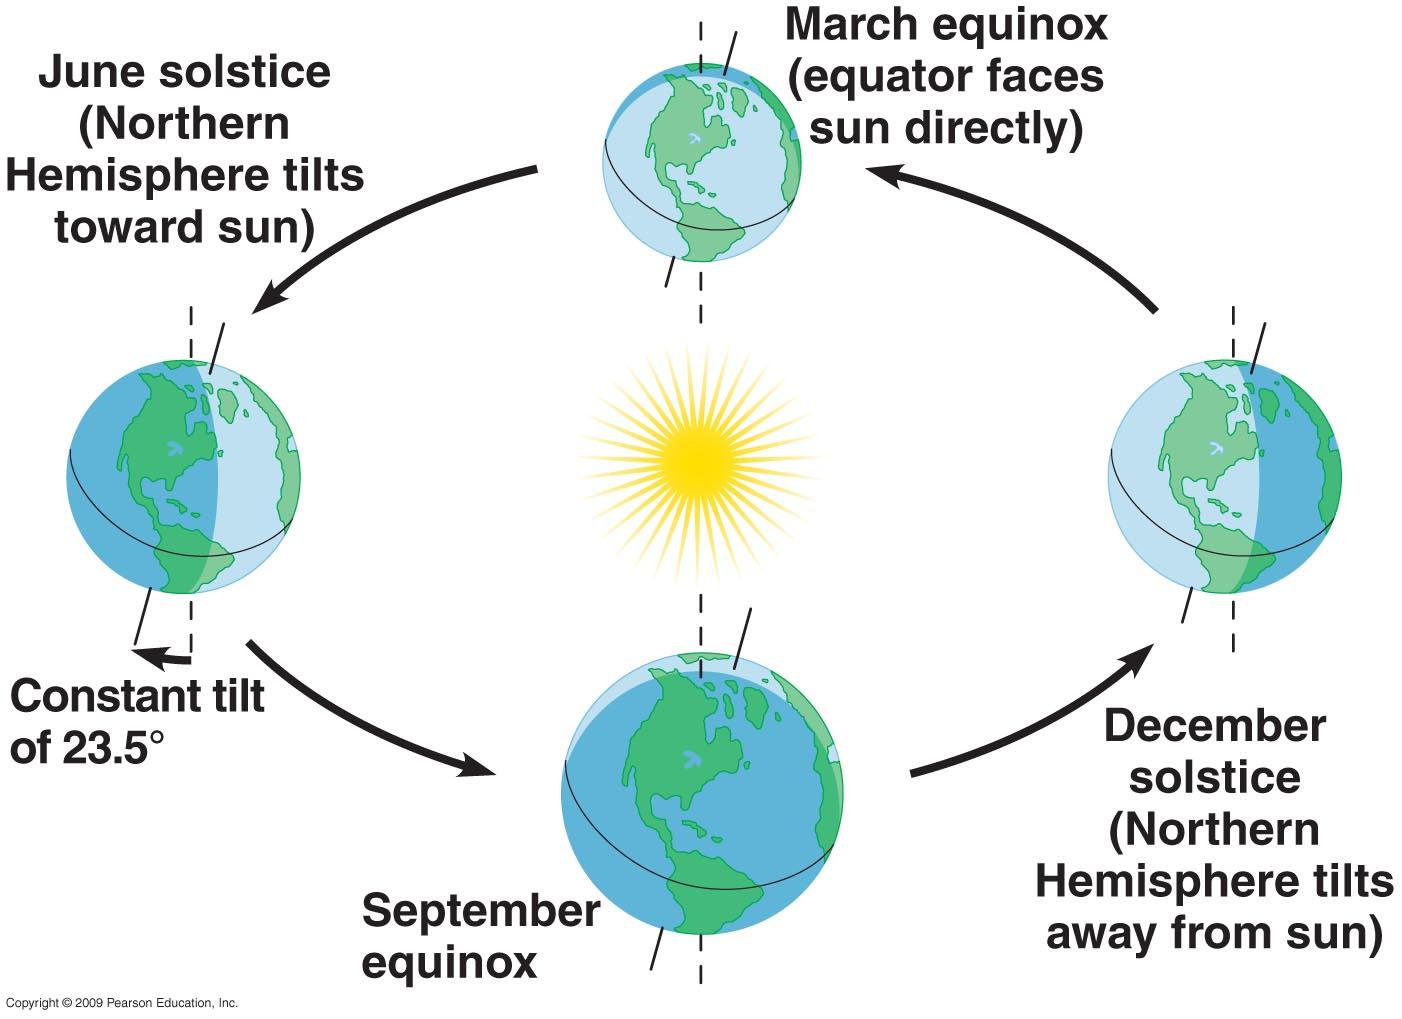 Northern Hemisphere Of The Seasons Worksheet_MBbzroe37W0Oe2XUlpN7F2sWOYZXv1xcfnIvAAaPH5ESHRICdA1afOcCWFdzbaffw87J9jdgxbFAtjsN1EZwug on Seasonal Tilt Seasons Worksheet 1